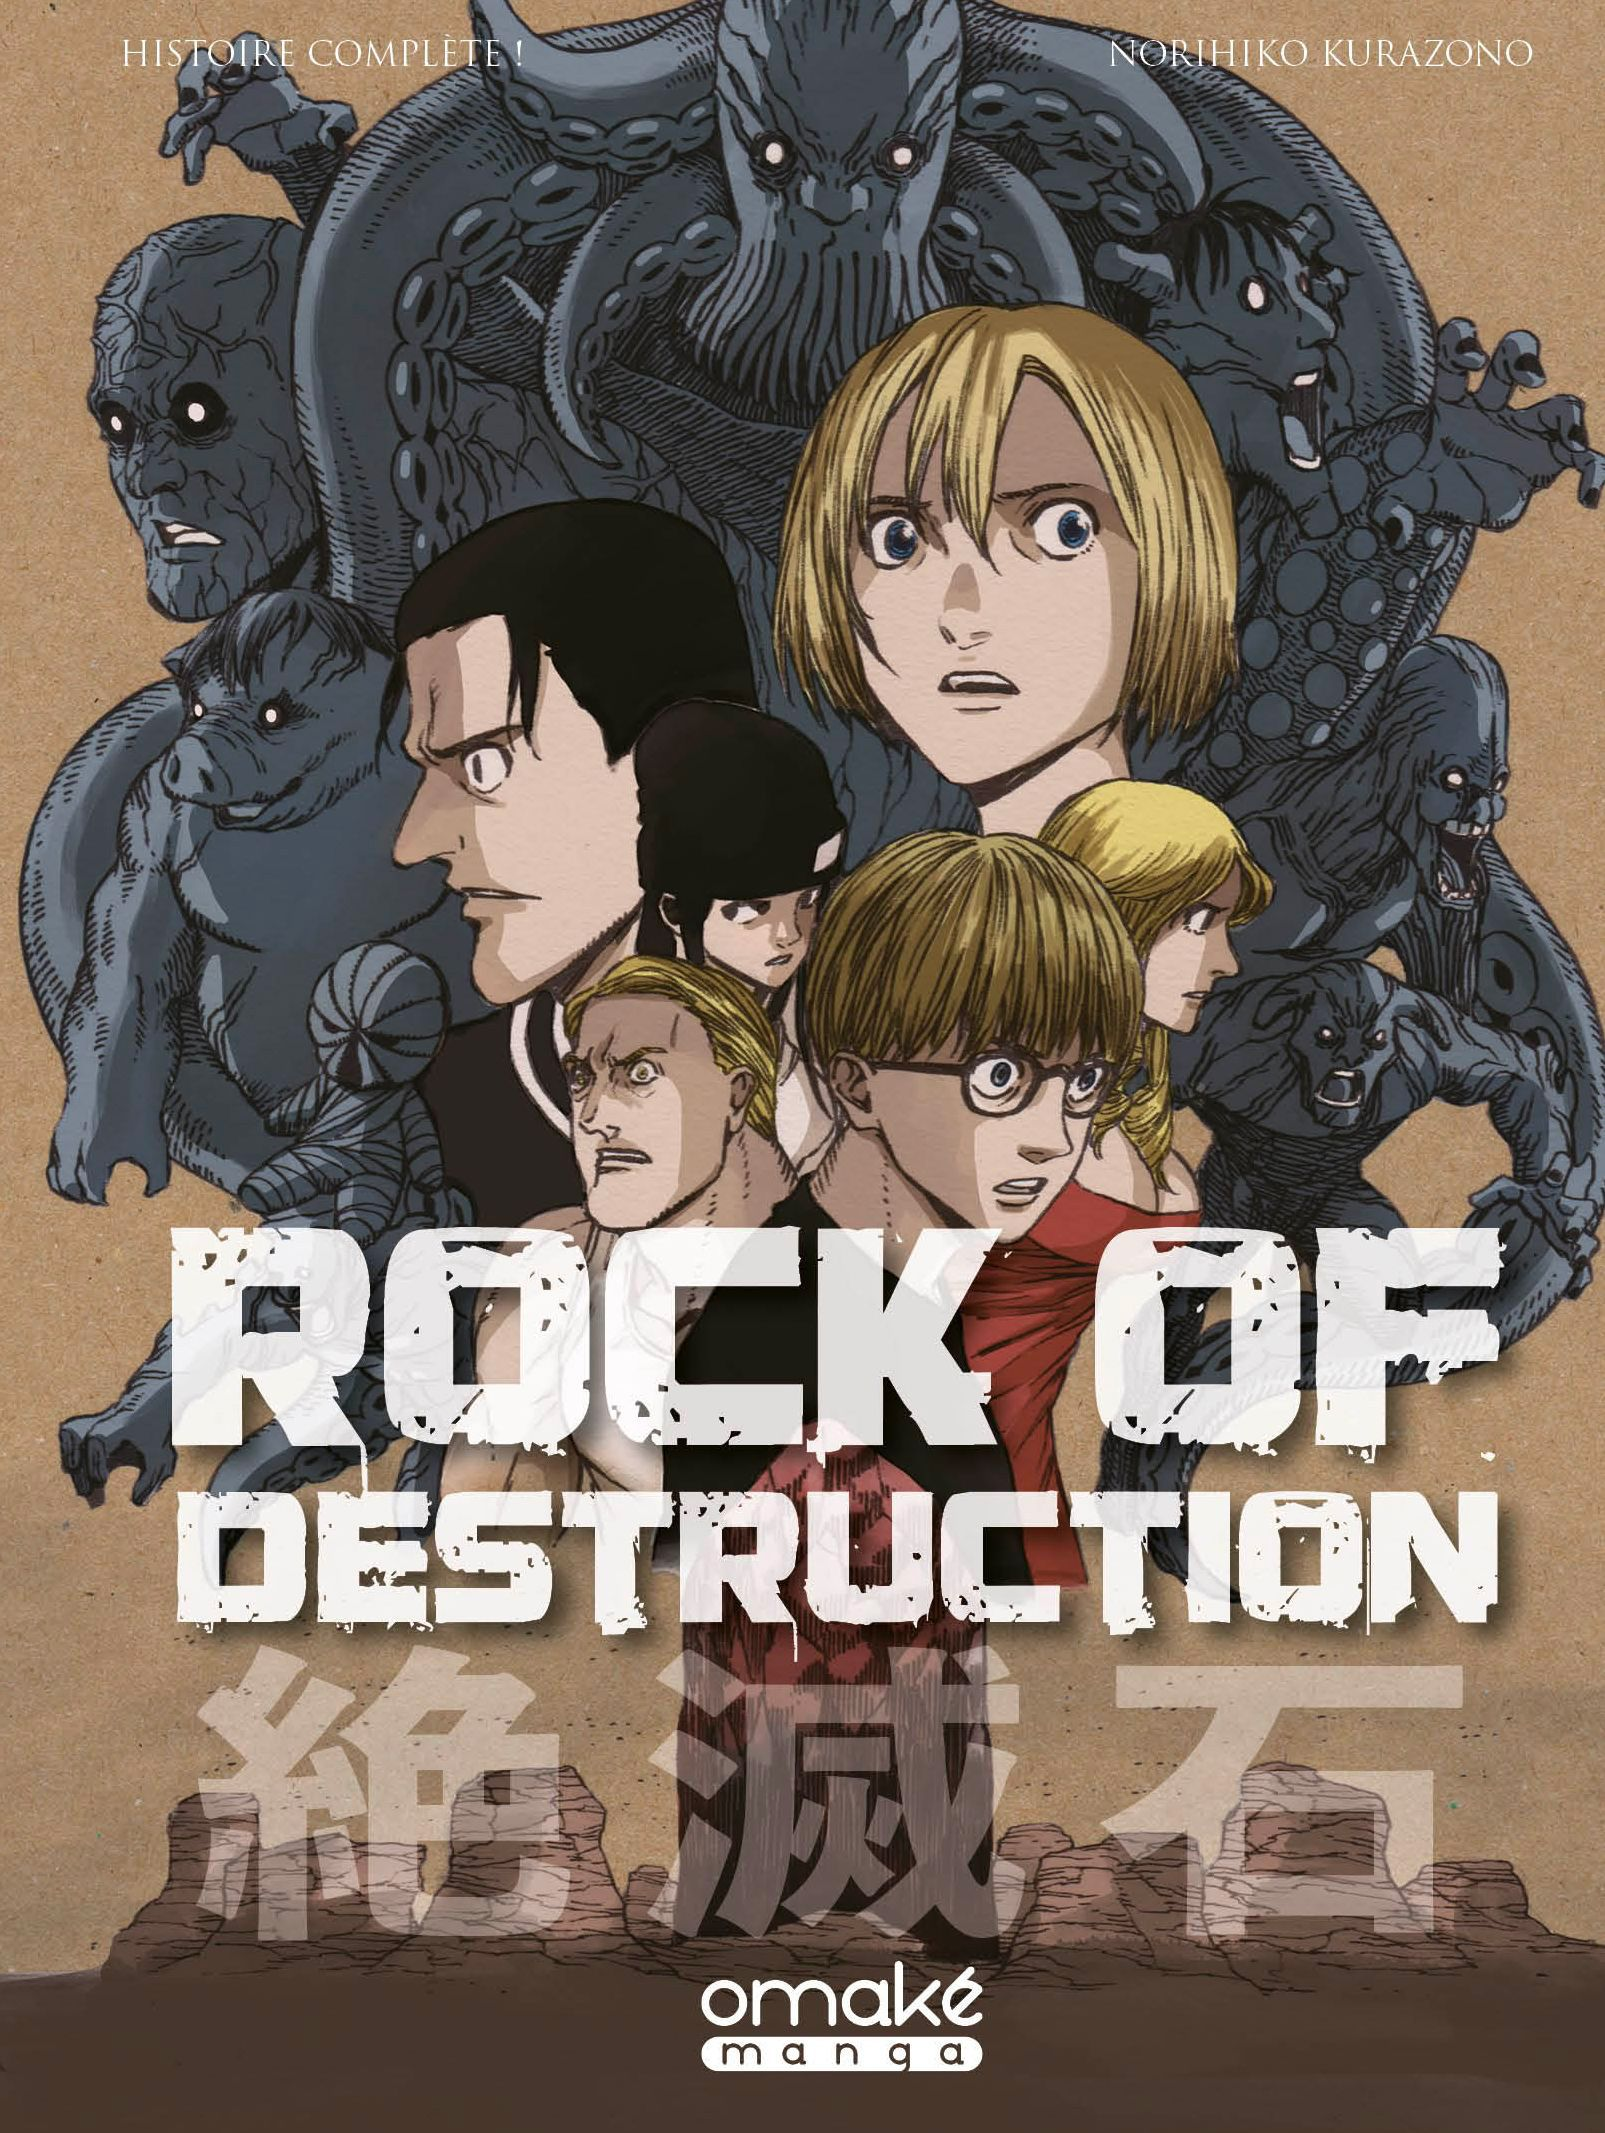 Sortie Manga au Québec JUILLET 2021 Rock-of-destruction-omake